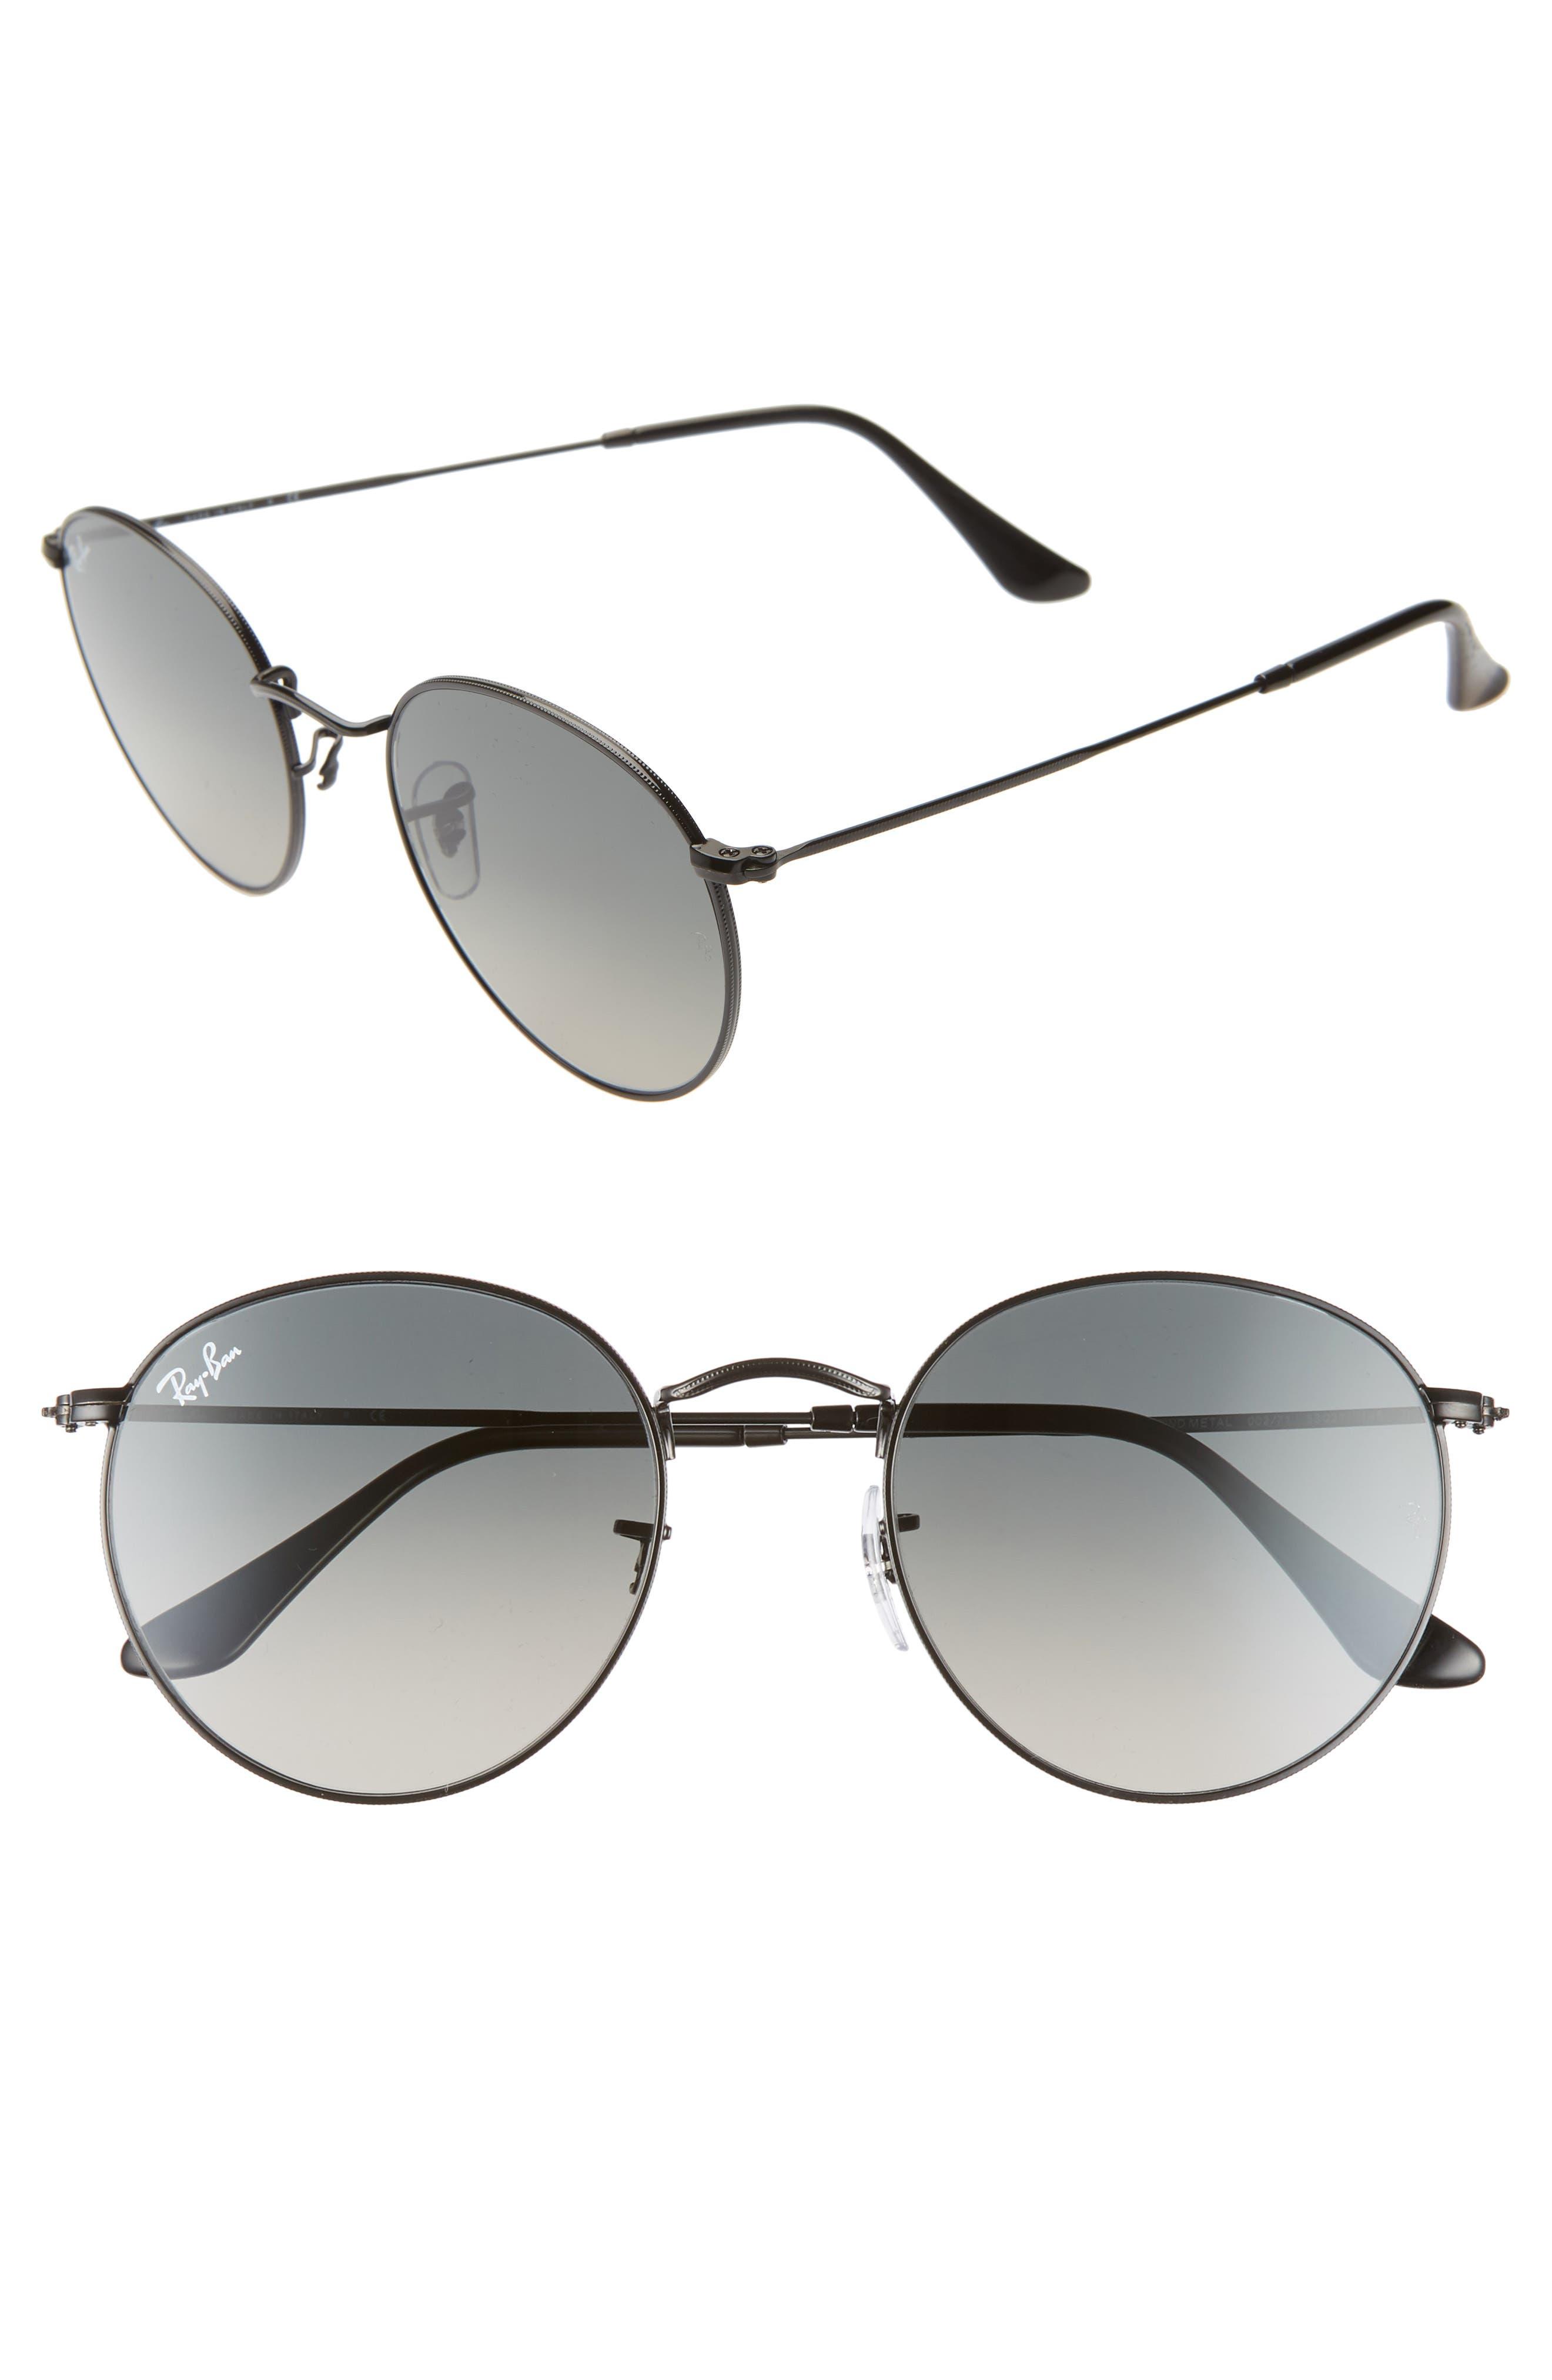 aa7621b2a2b76 Round ray ban sunglasses nordstrom jpg 480x730 Icon 53mm retro